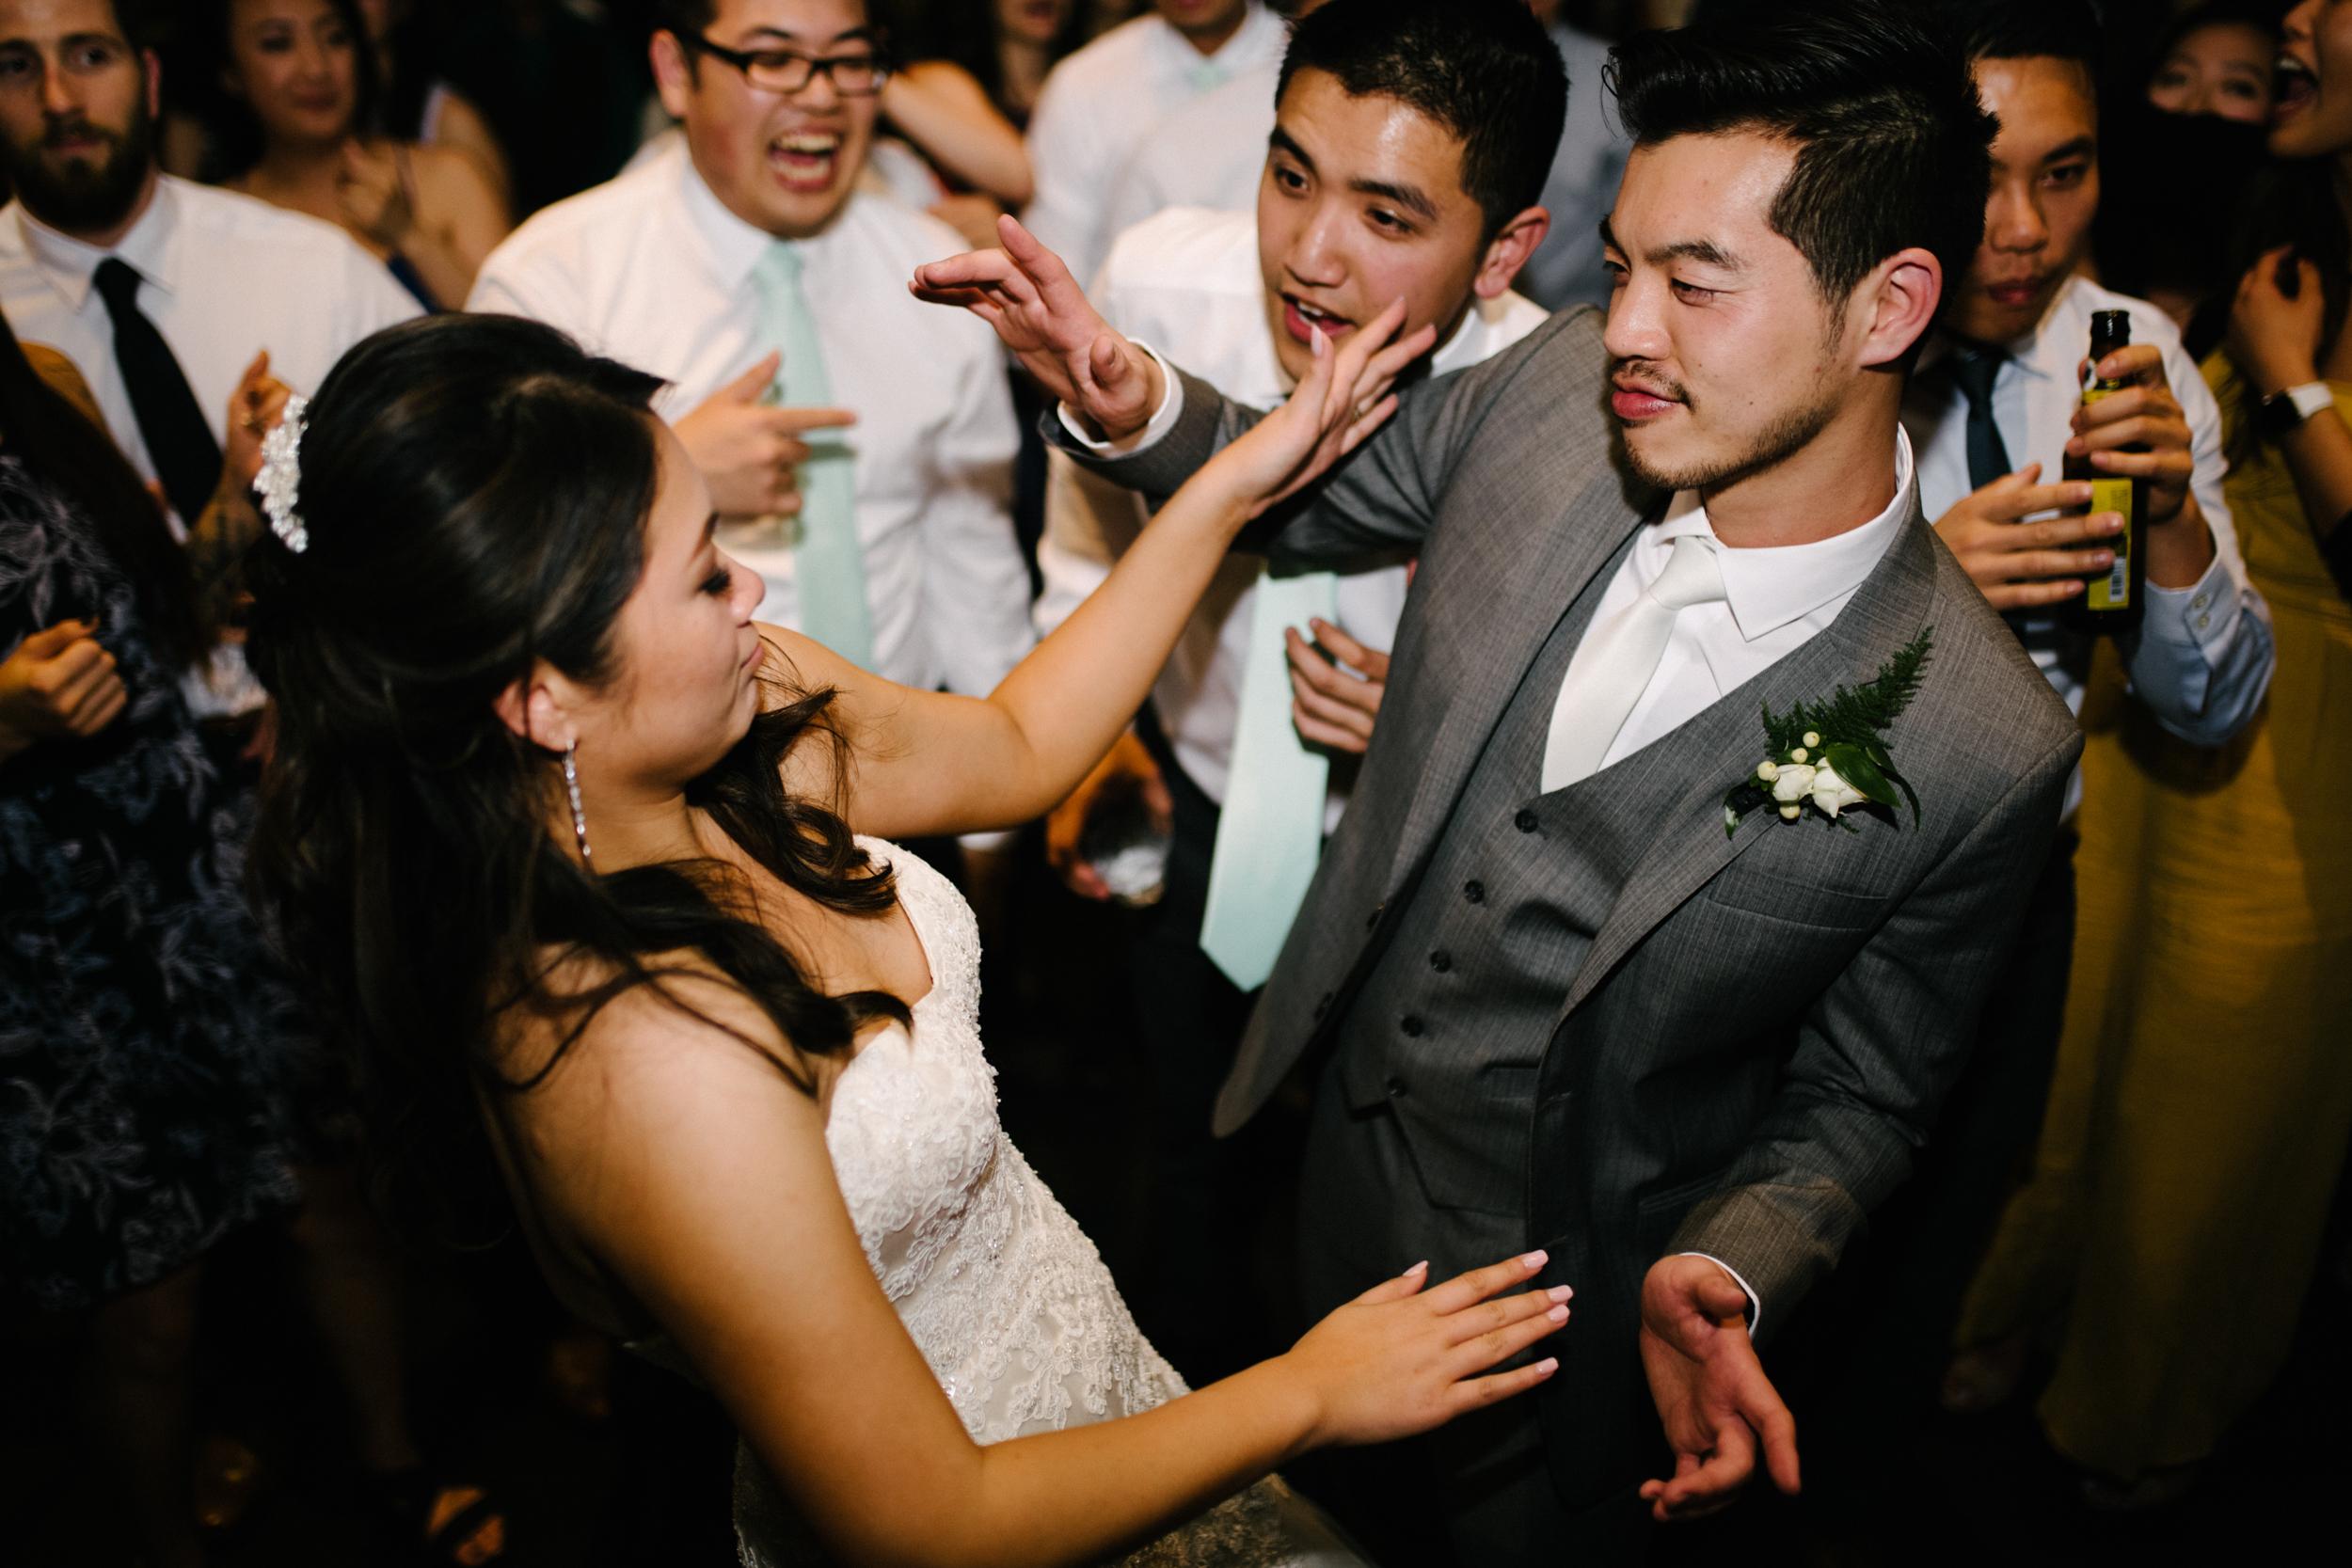 wedding_coronado_community_center-44.jpg